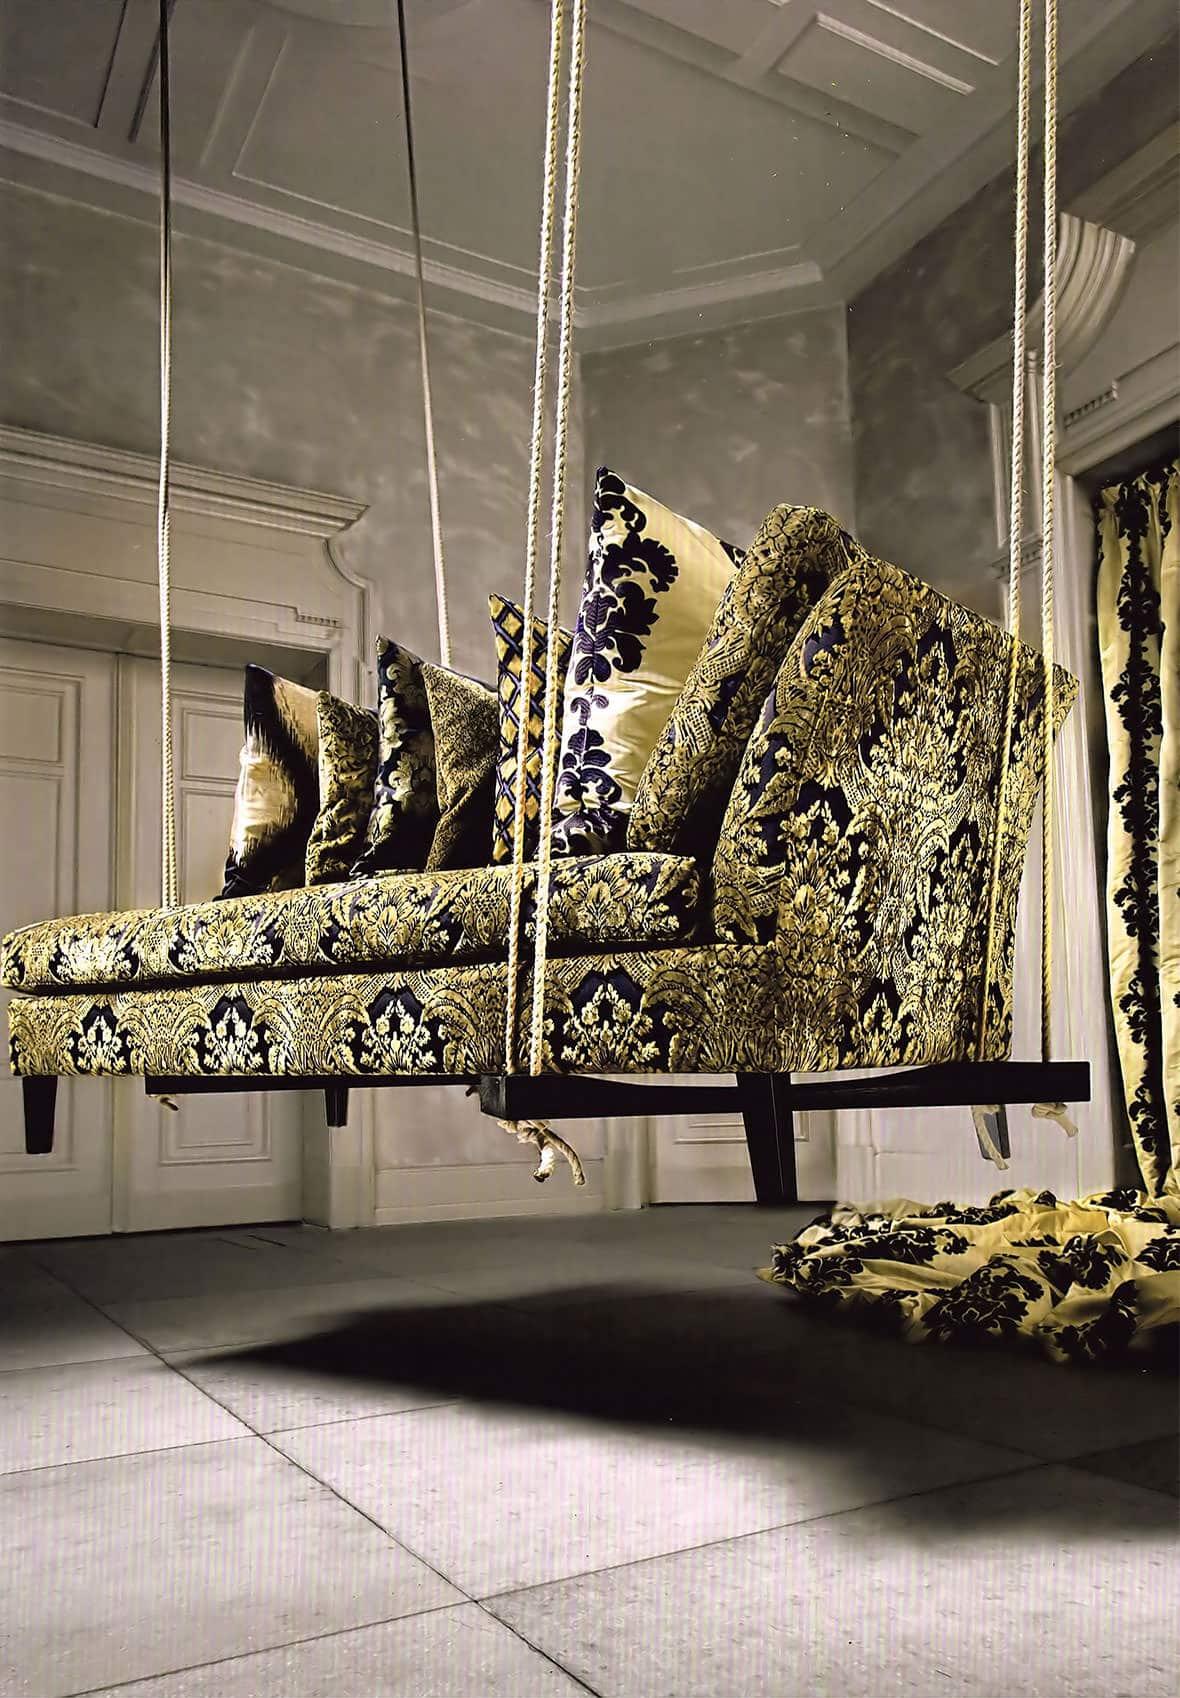 baroque tissus d 39 ameublement annecy voilages coussins rideaux stores. Black Bedroom Furniture Sets. Home Design Ideas